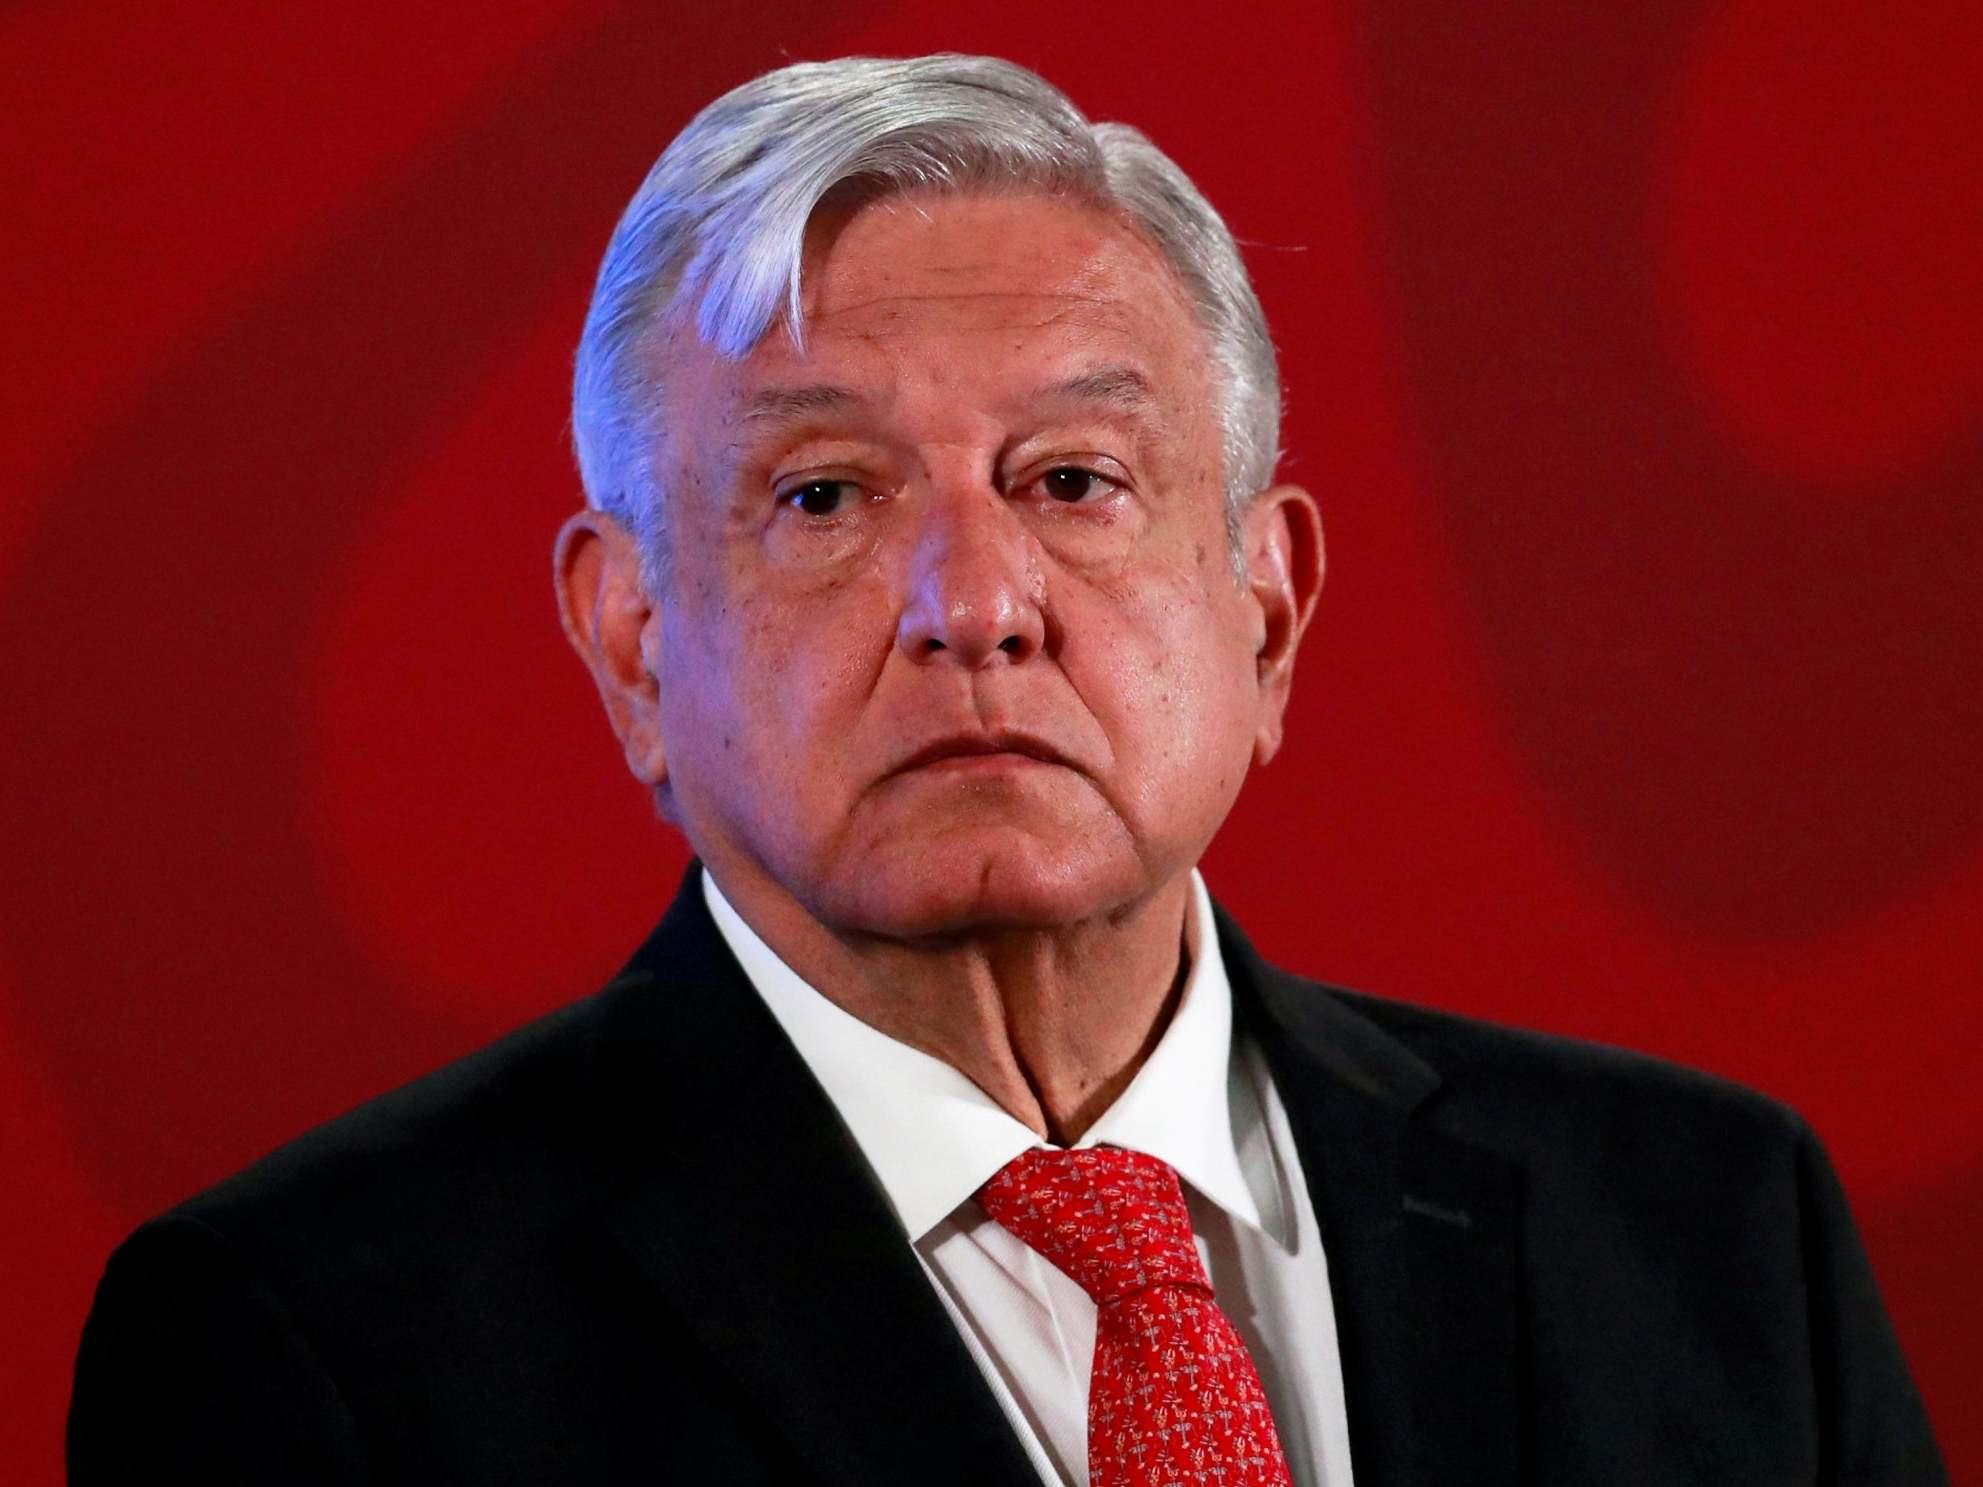 Mexican president says most domestic violence calls are 'fake' despite lockdown rise in femicide